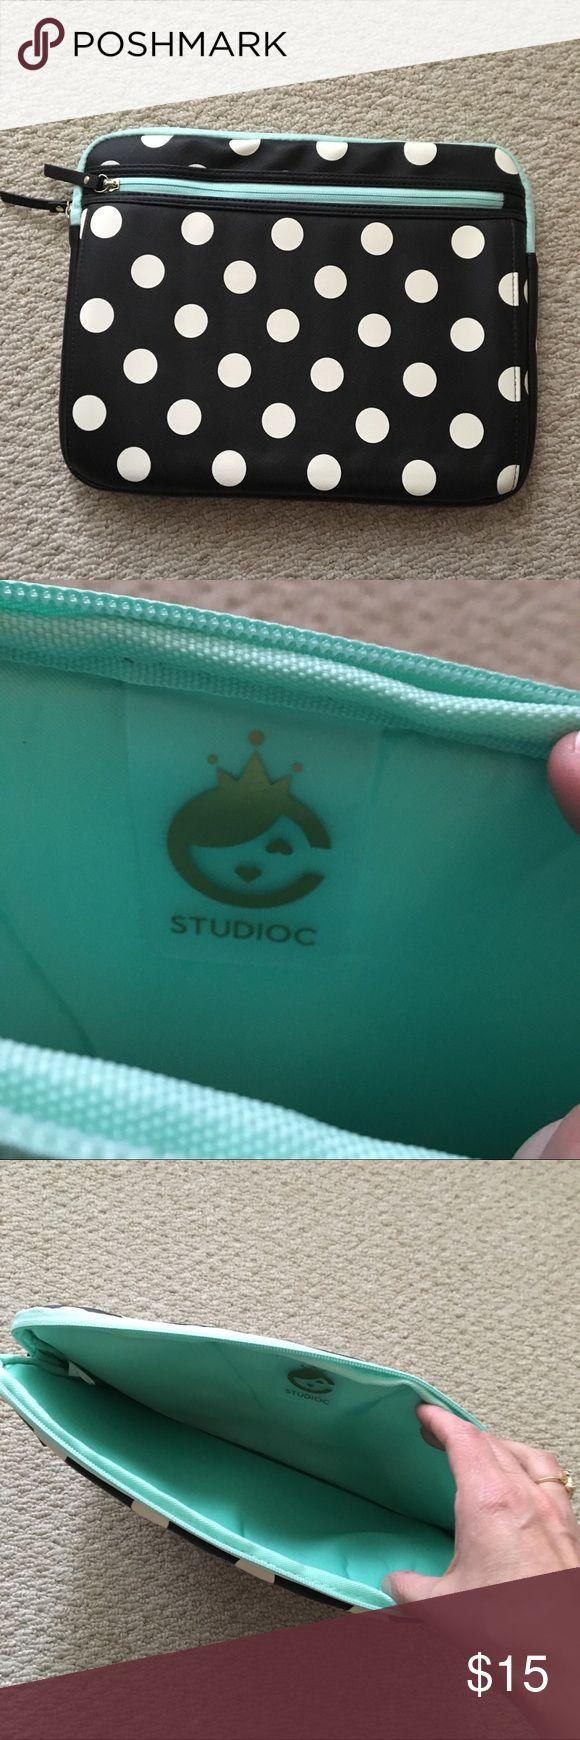 New Laptop Pouch by Studioc Black laptop pouch by …